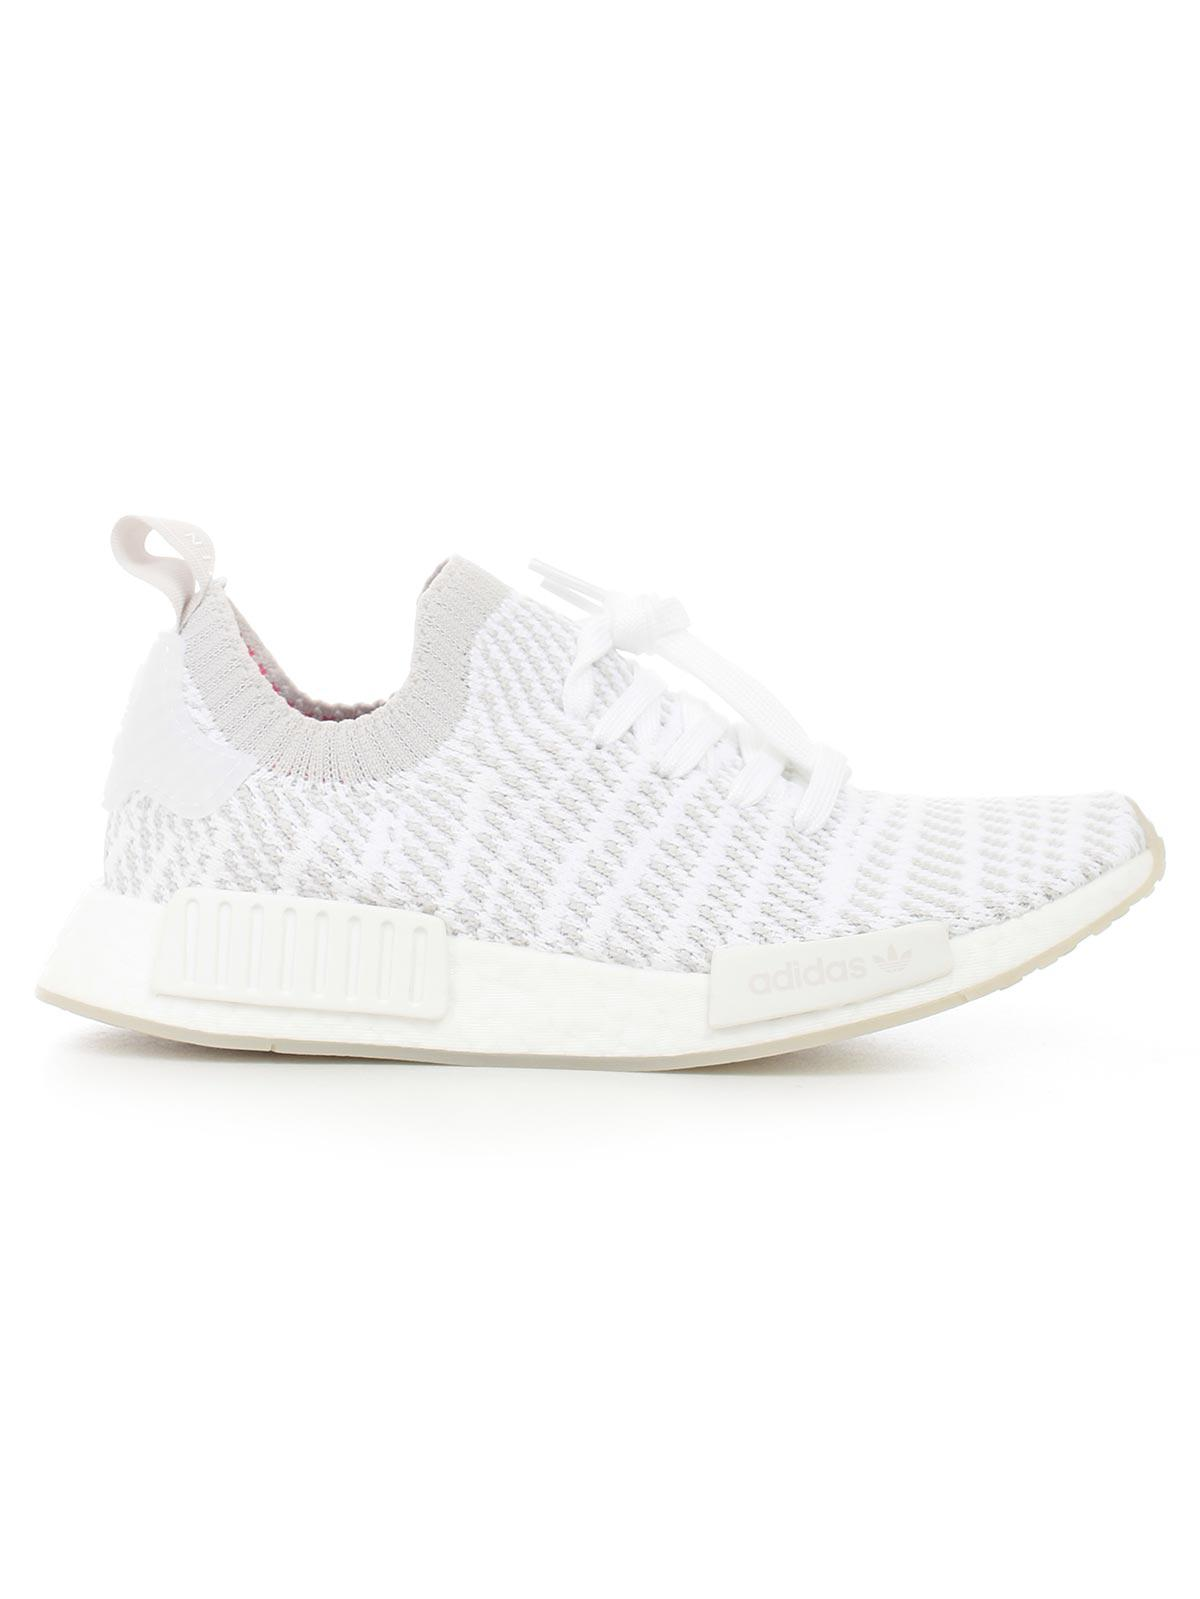 1c6bdf06431ec Lyst - Adidas Originals Sneakers Nmd R1 in White for Men